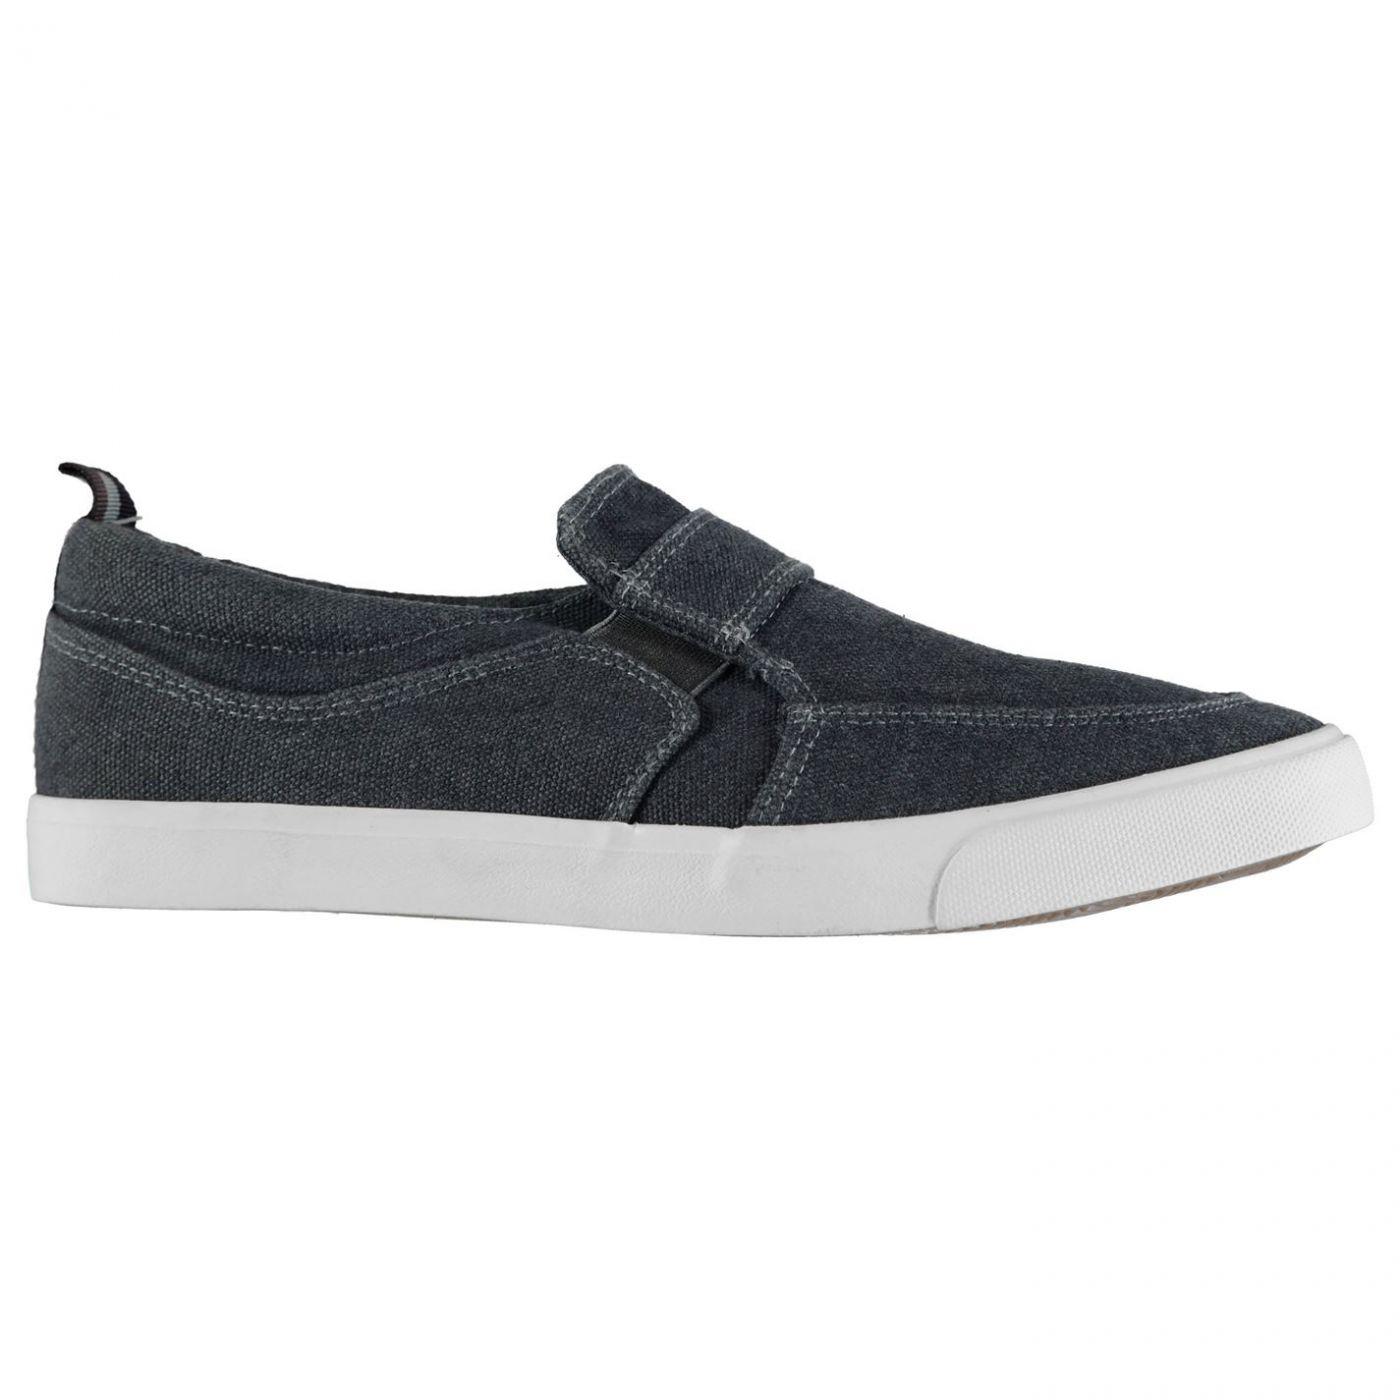 Lee Cooper Kenji pánske plátené topánky